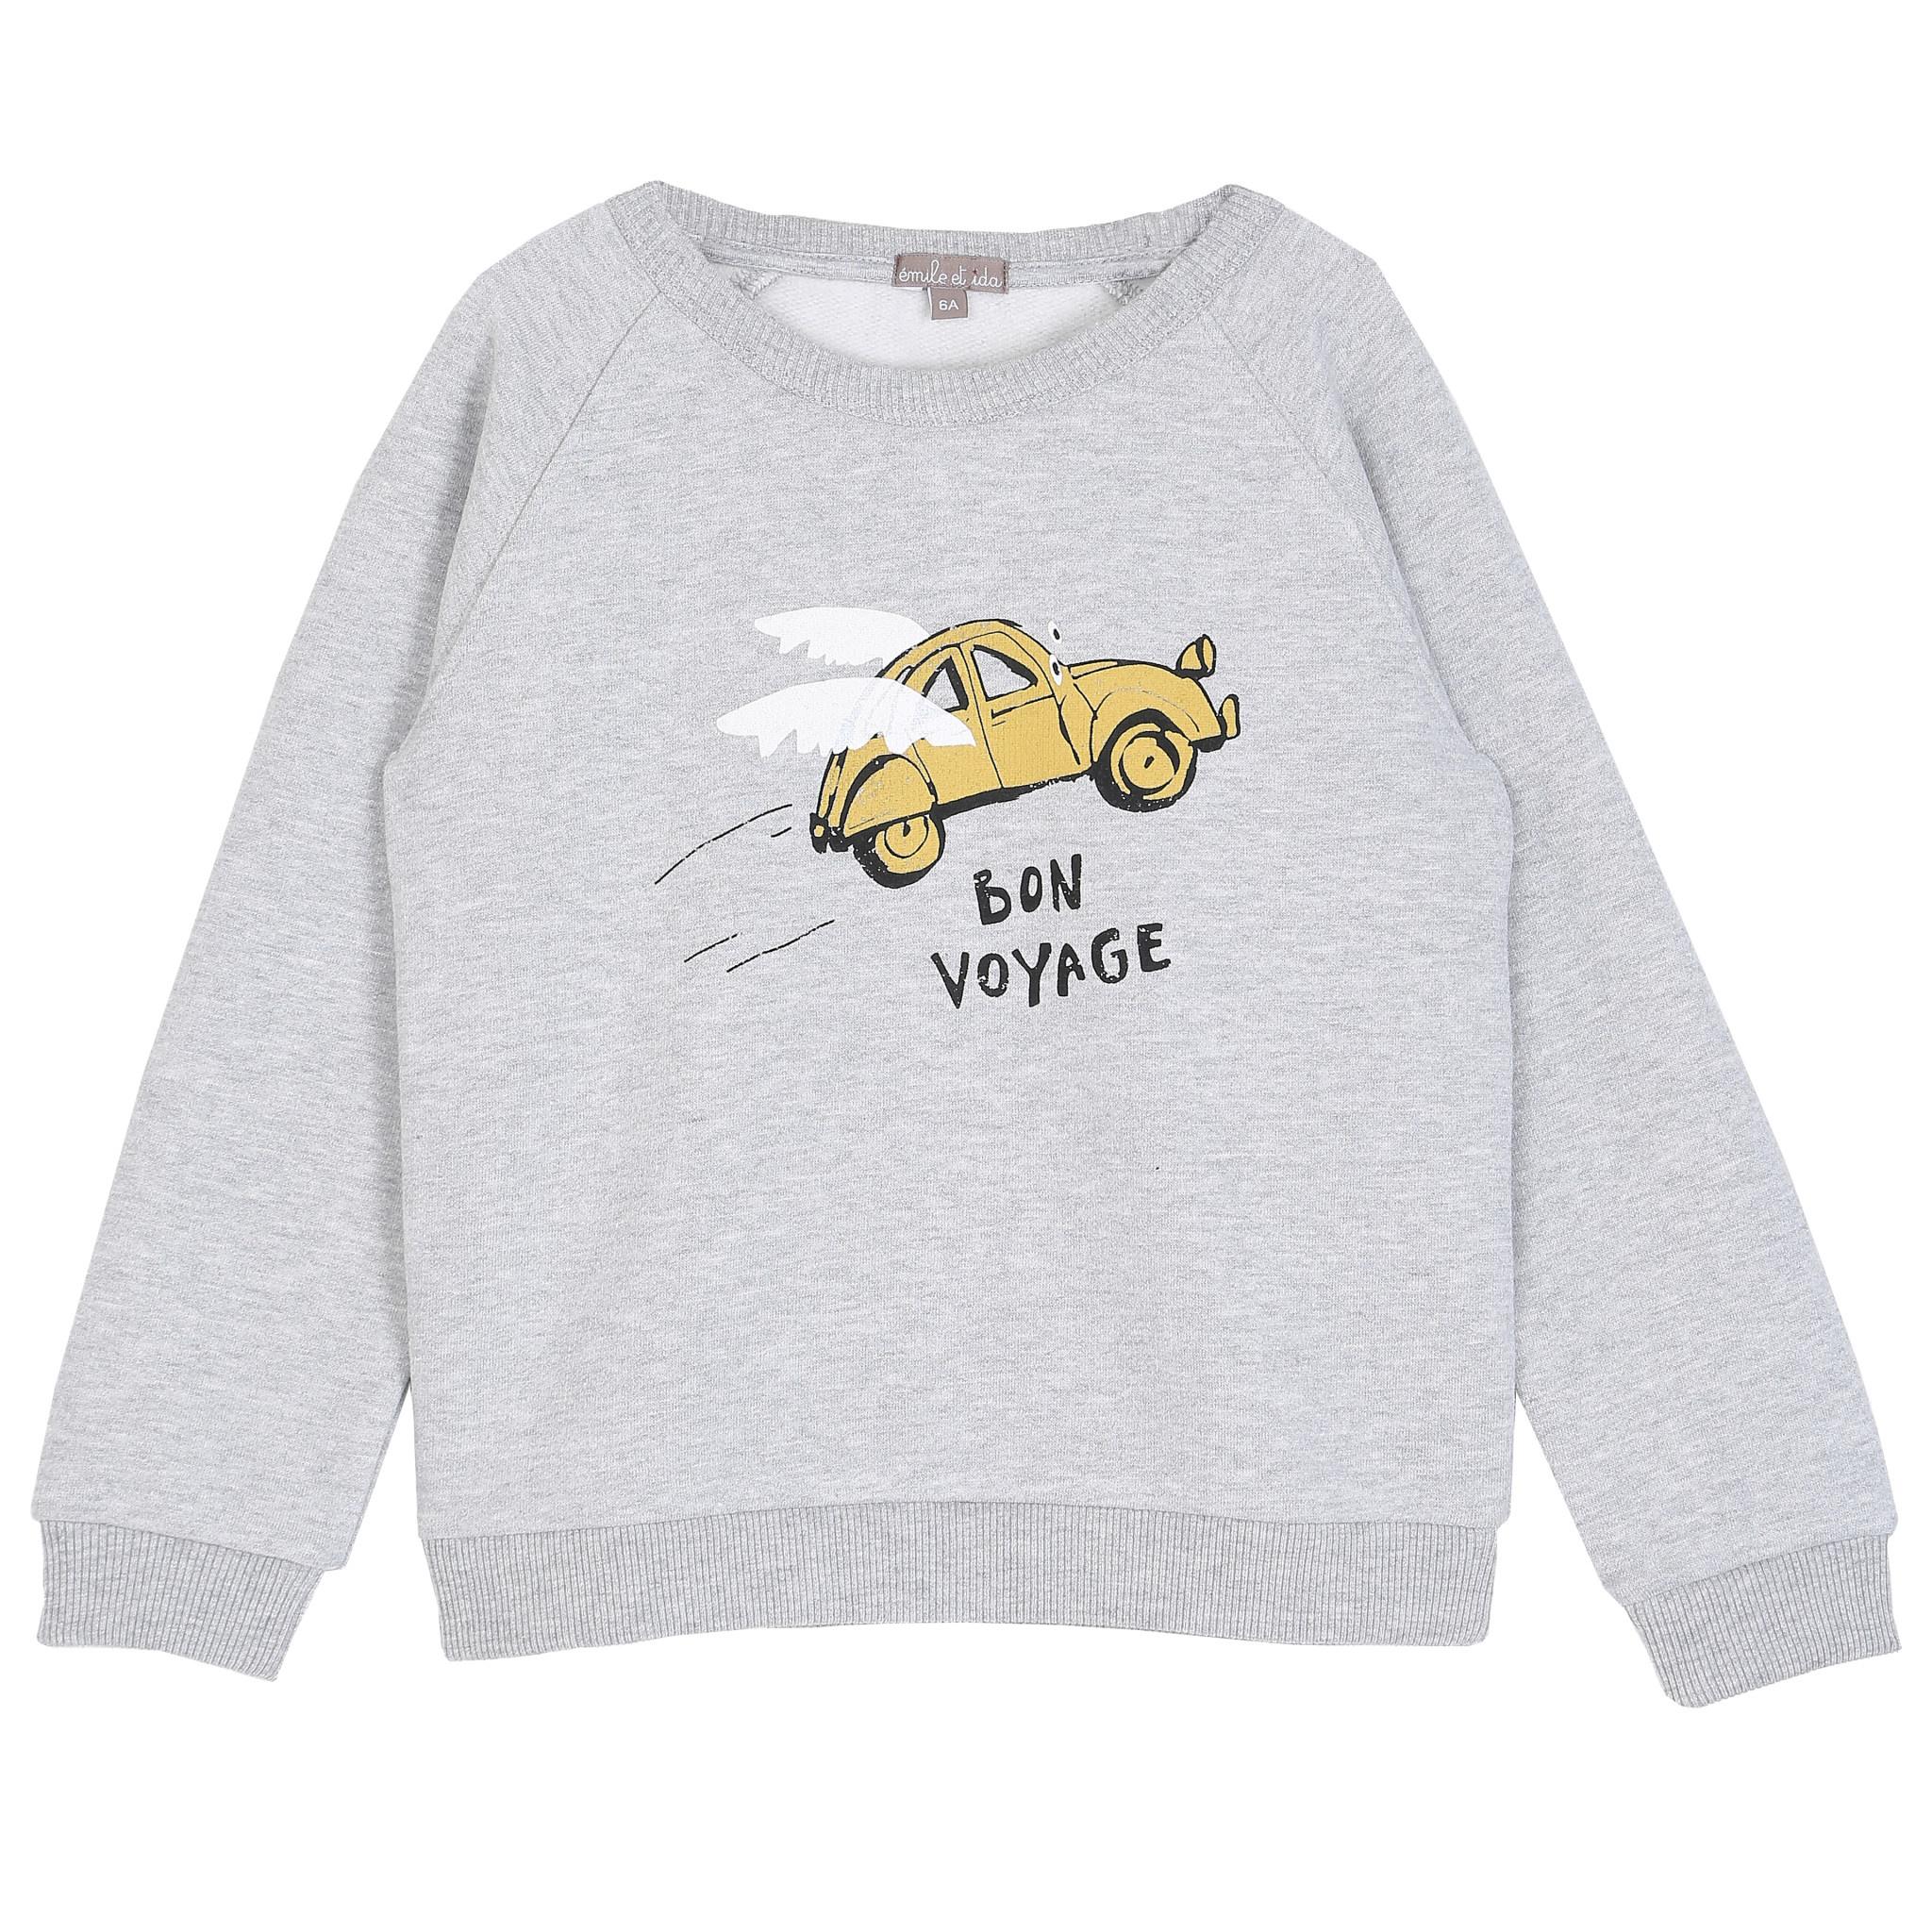 Sweatshirt gris chine bon voyage-1